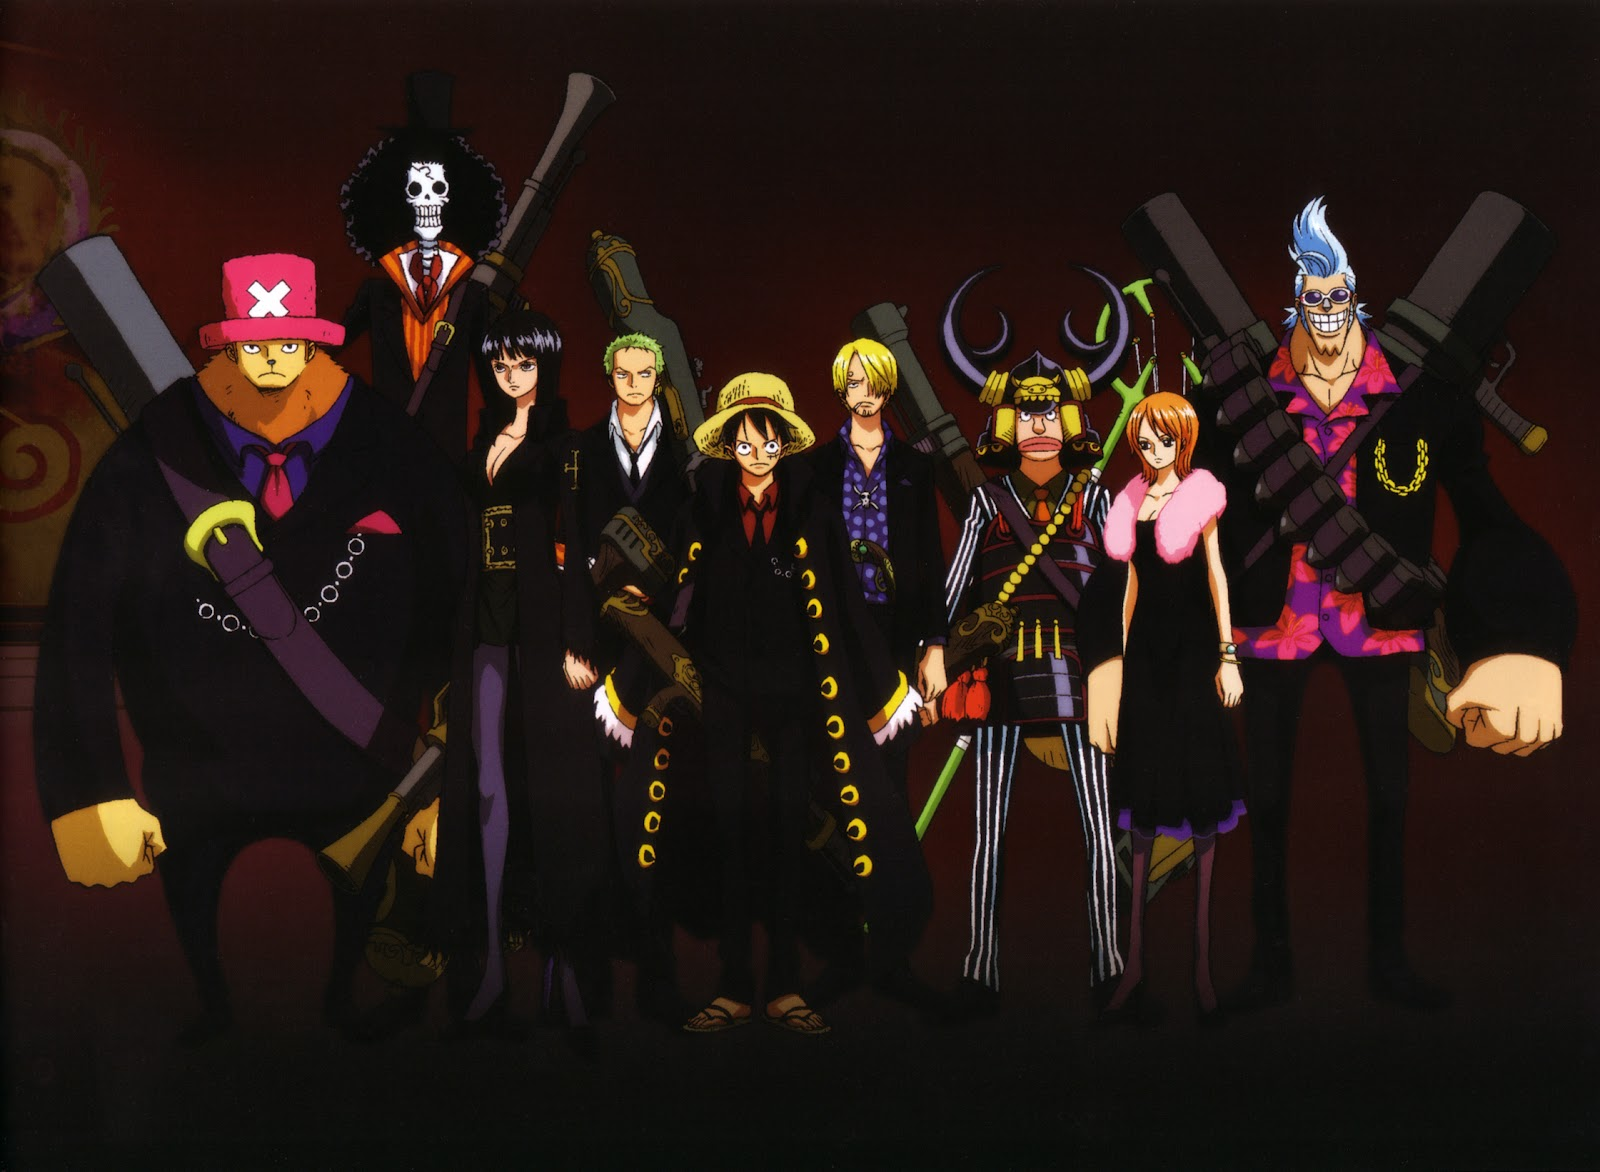 Foto Dan Wallpaper Anime One Piece